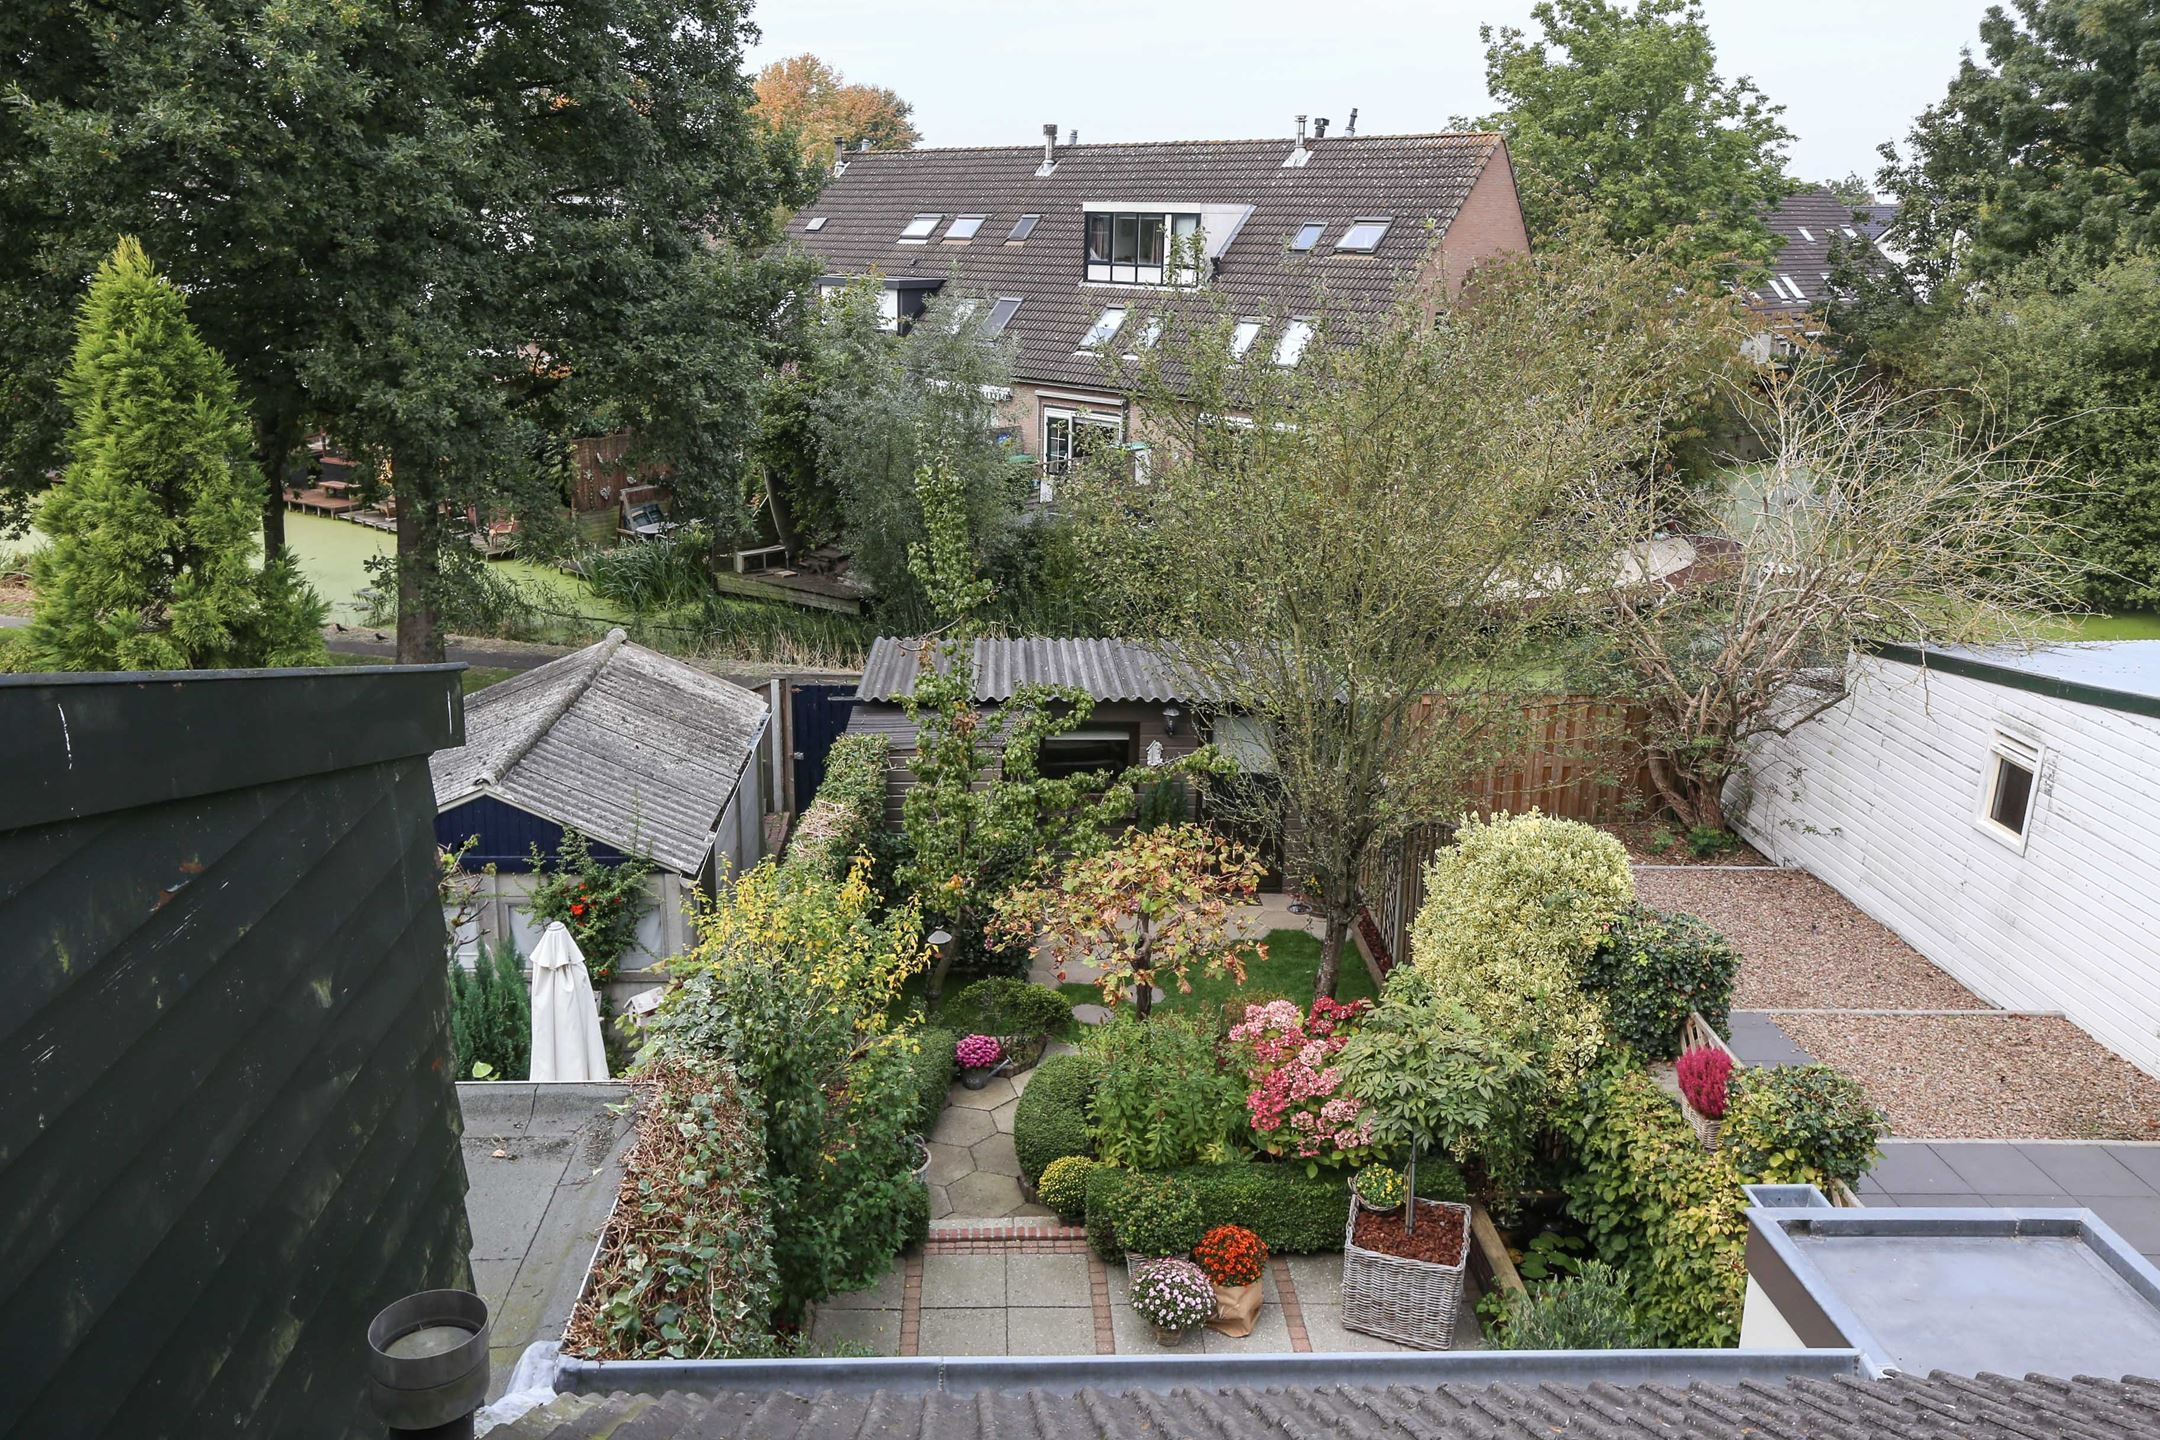 Huis te koop: zinkweg 28 3262 ba oud beijerland [funda]